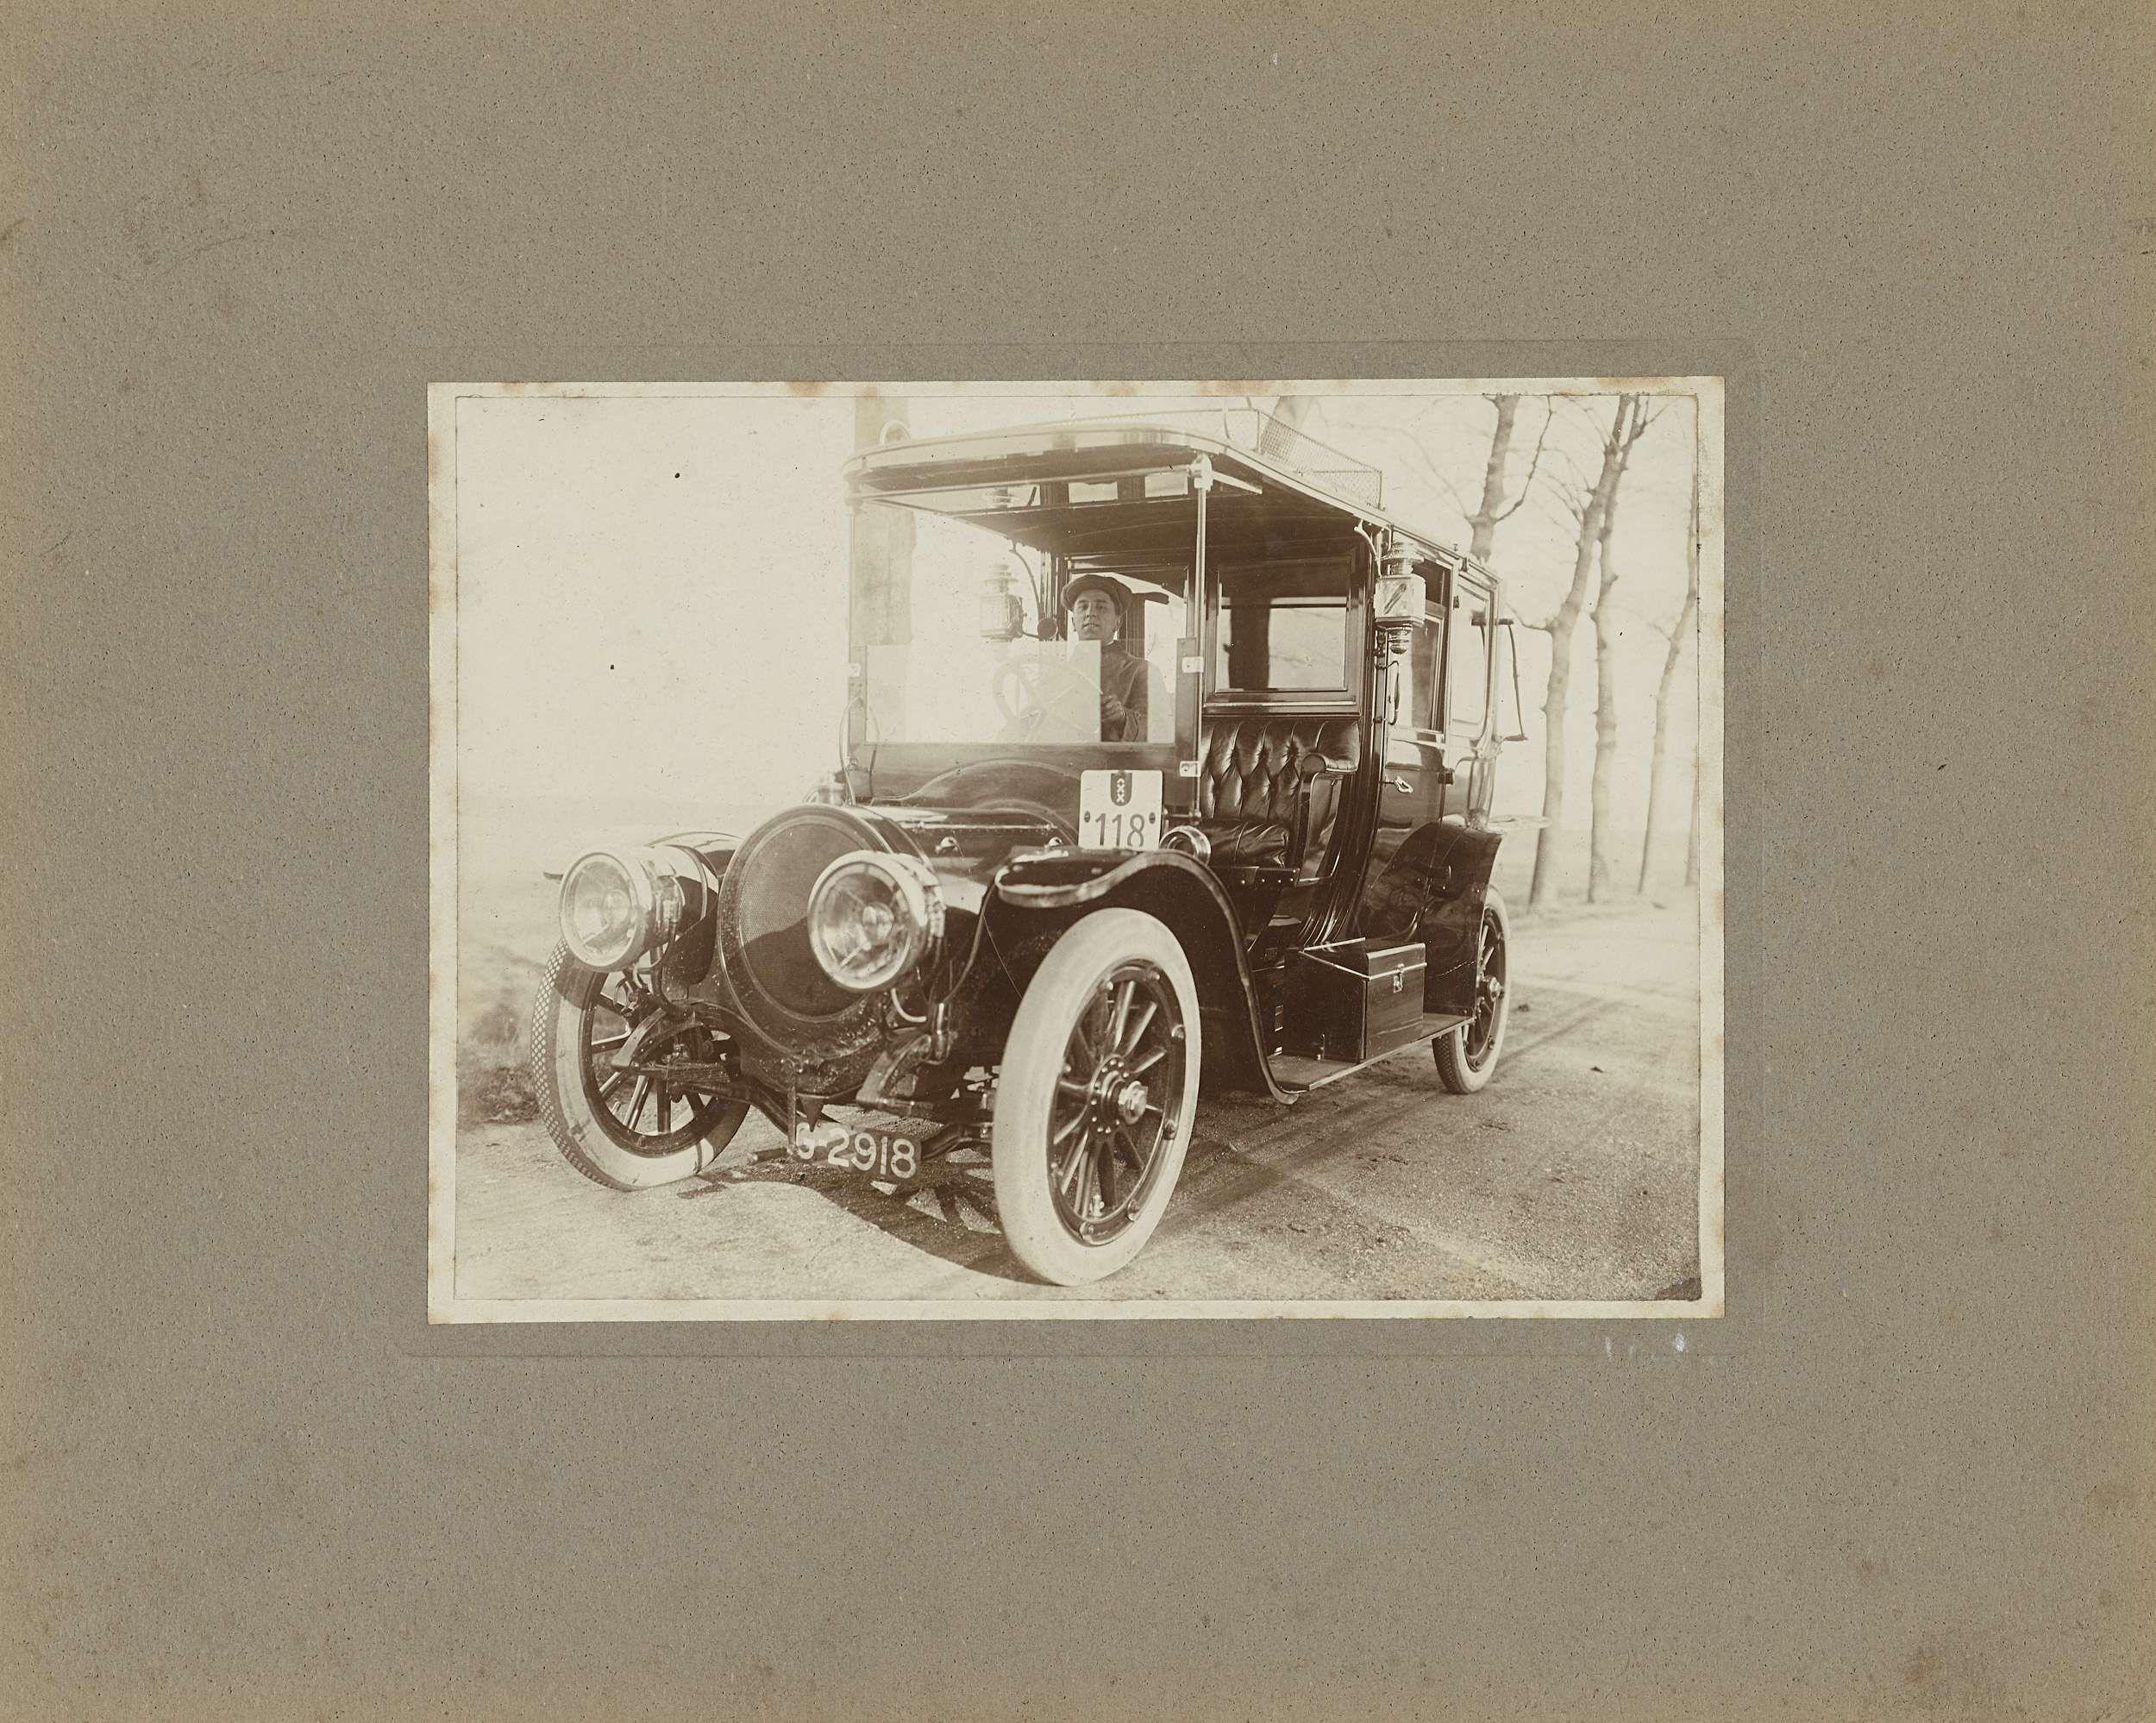 Anonymous | Man in automobiel, nummer 118, voor huis, Anonymous, 1900 - 1920 |